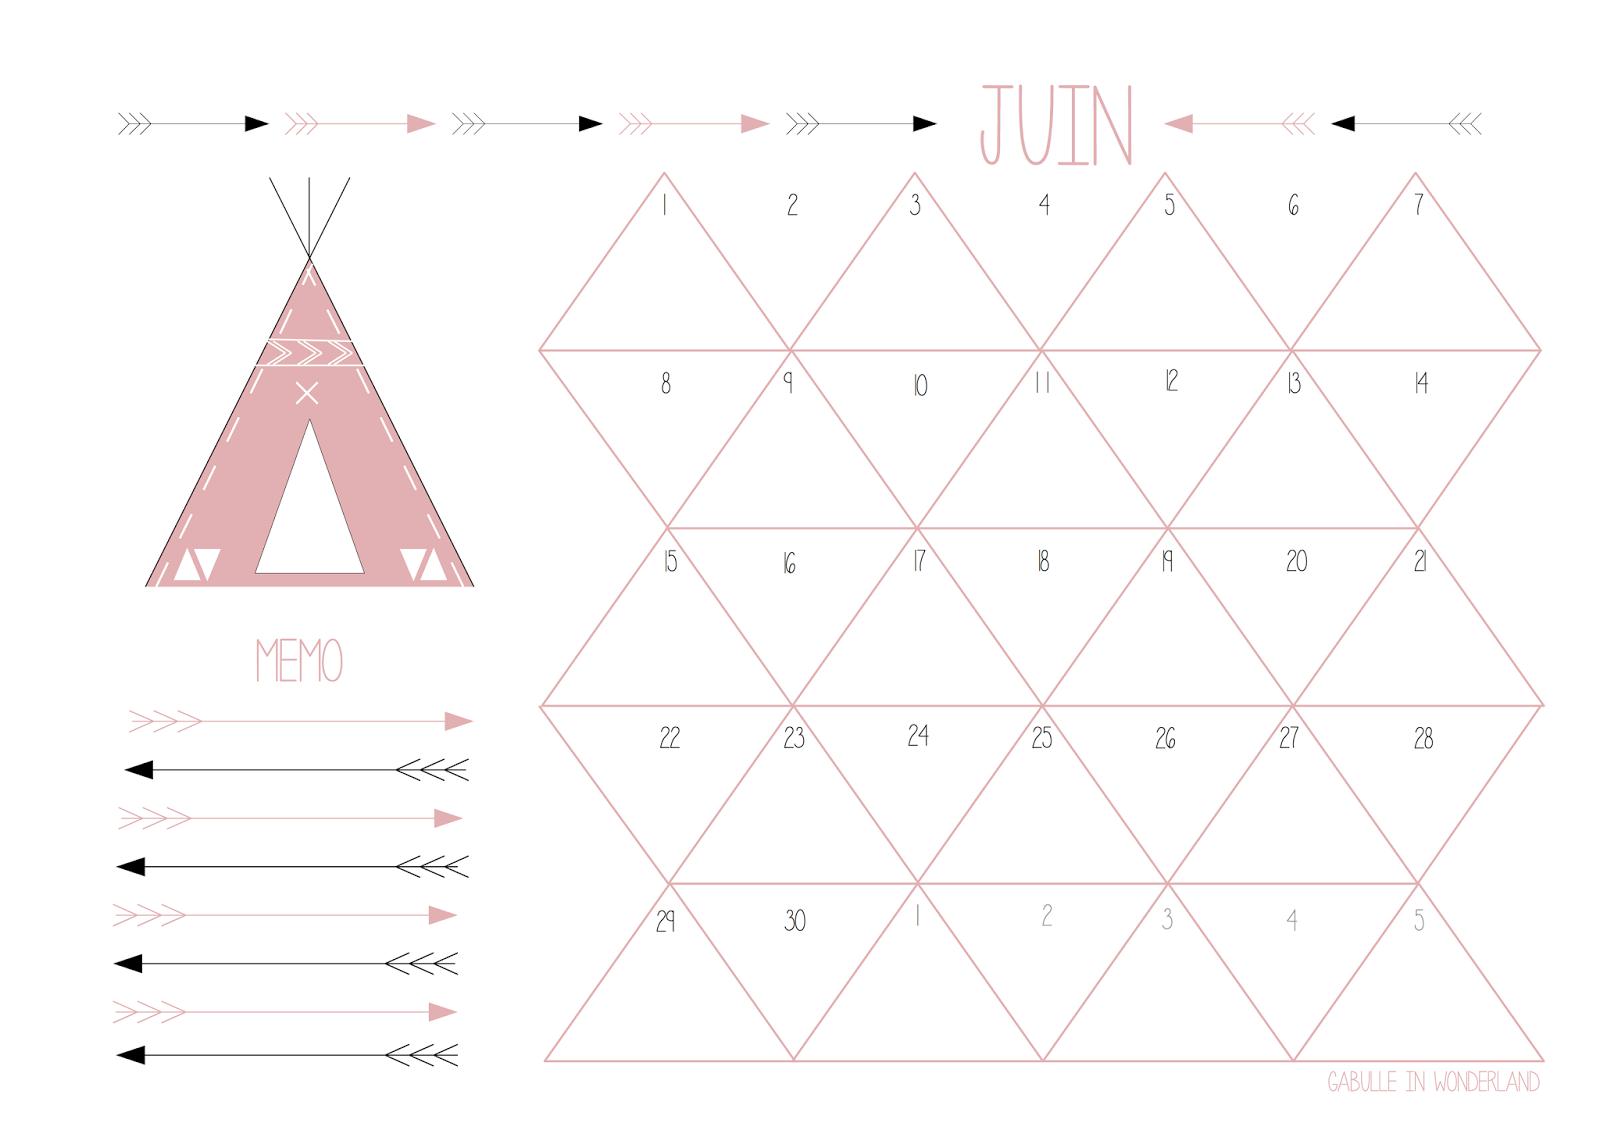 Gabulle in wonderland calendrier du mois de juin imprimer - Calendrier du mois de juin 2017 ...